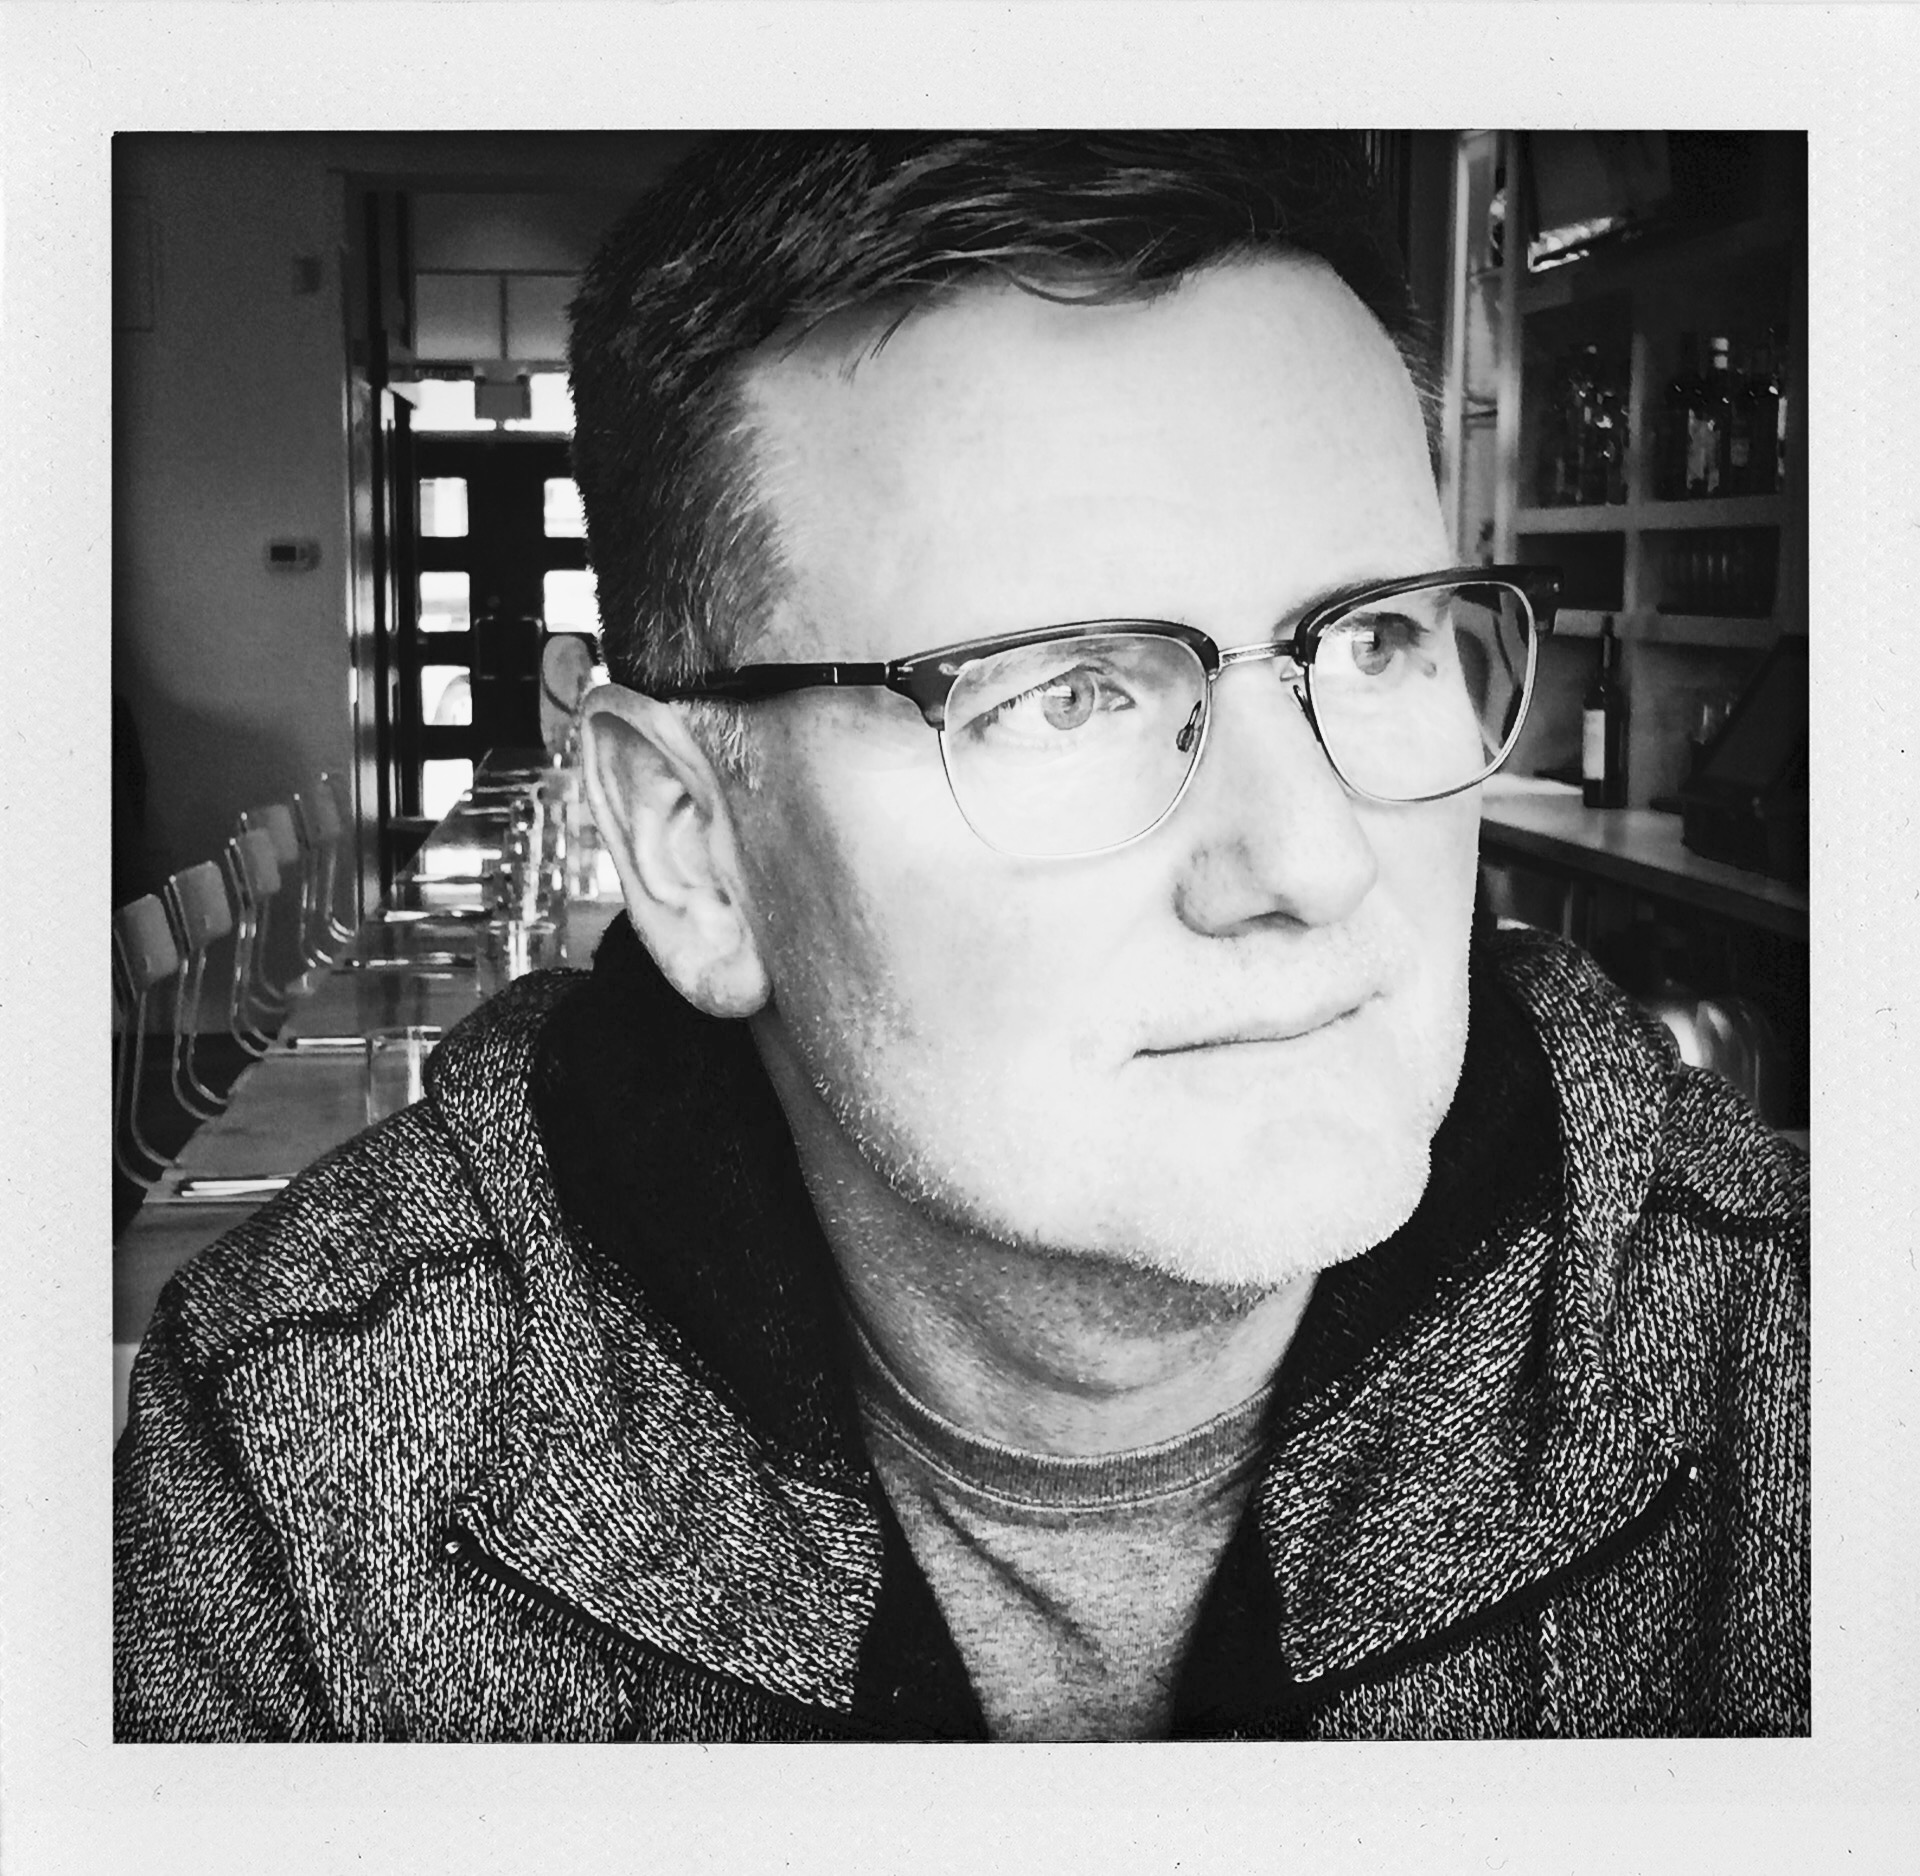 William Baird, music composer for TV and film